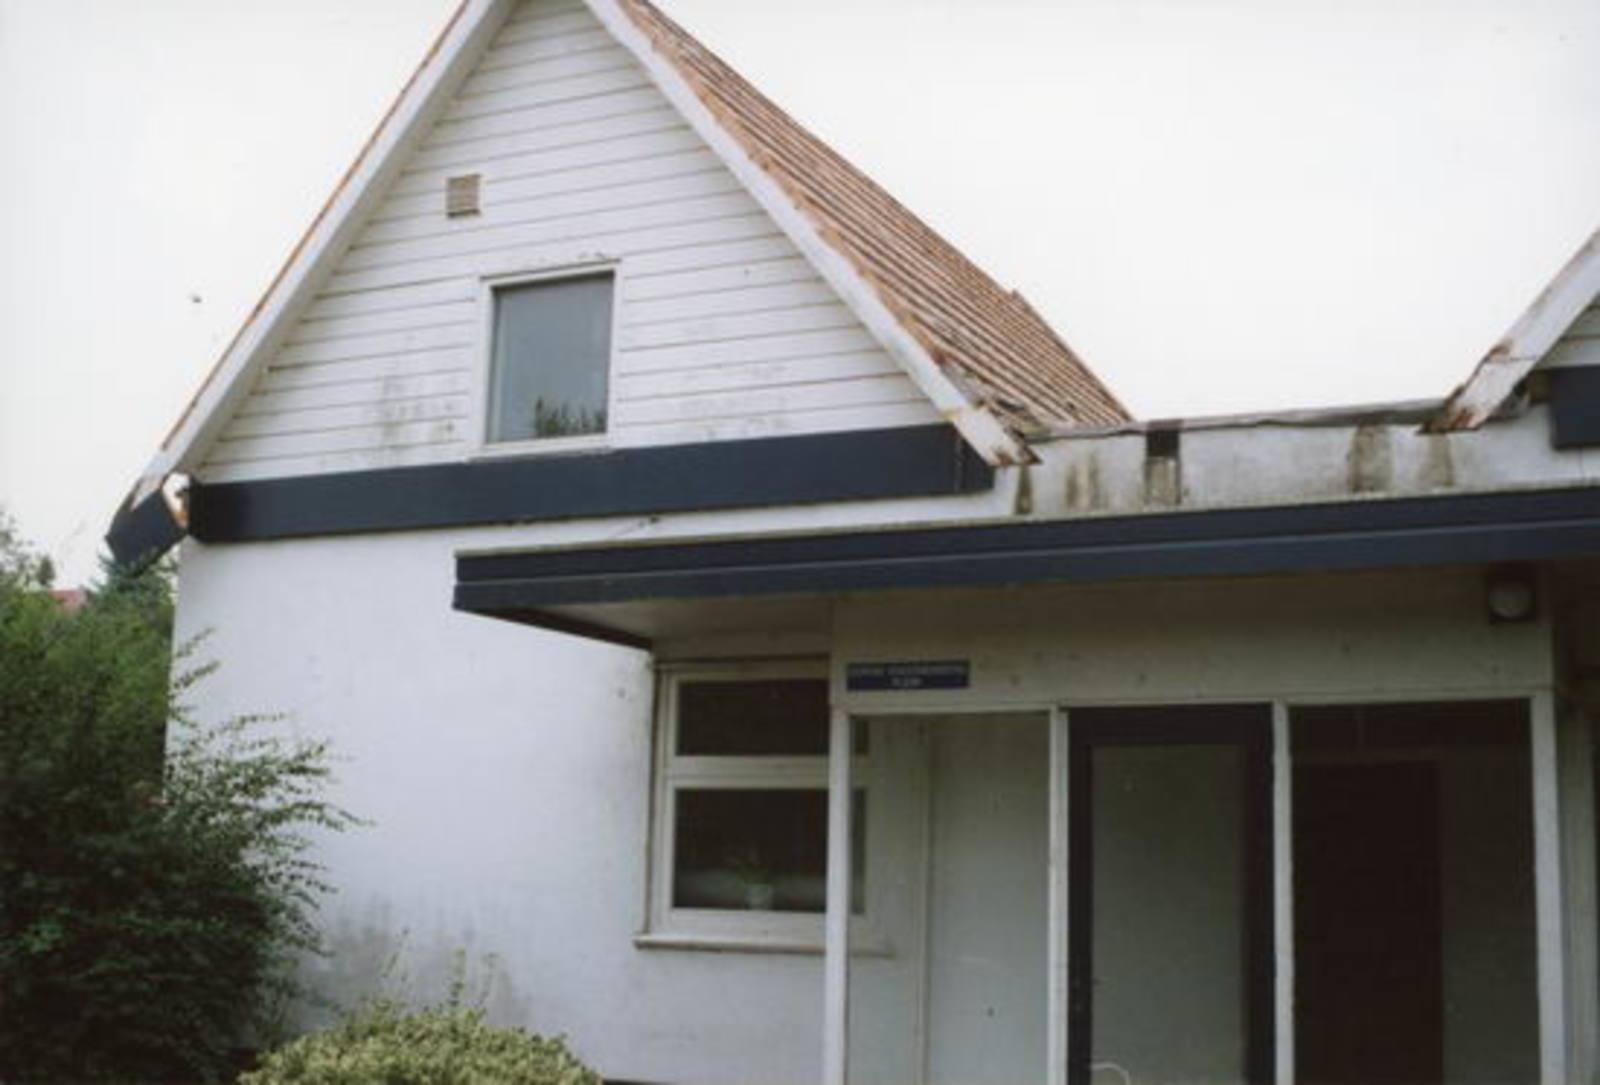 Rijnlanderweg W 0861 2001 Huize 03